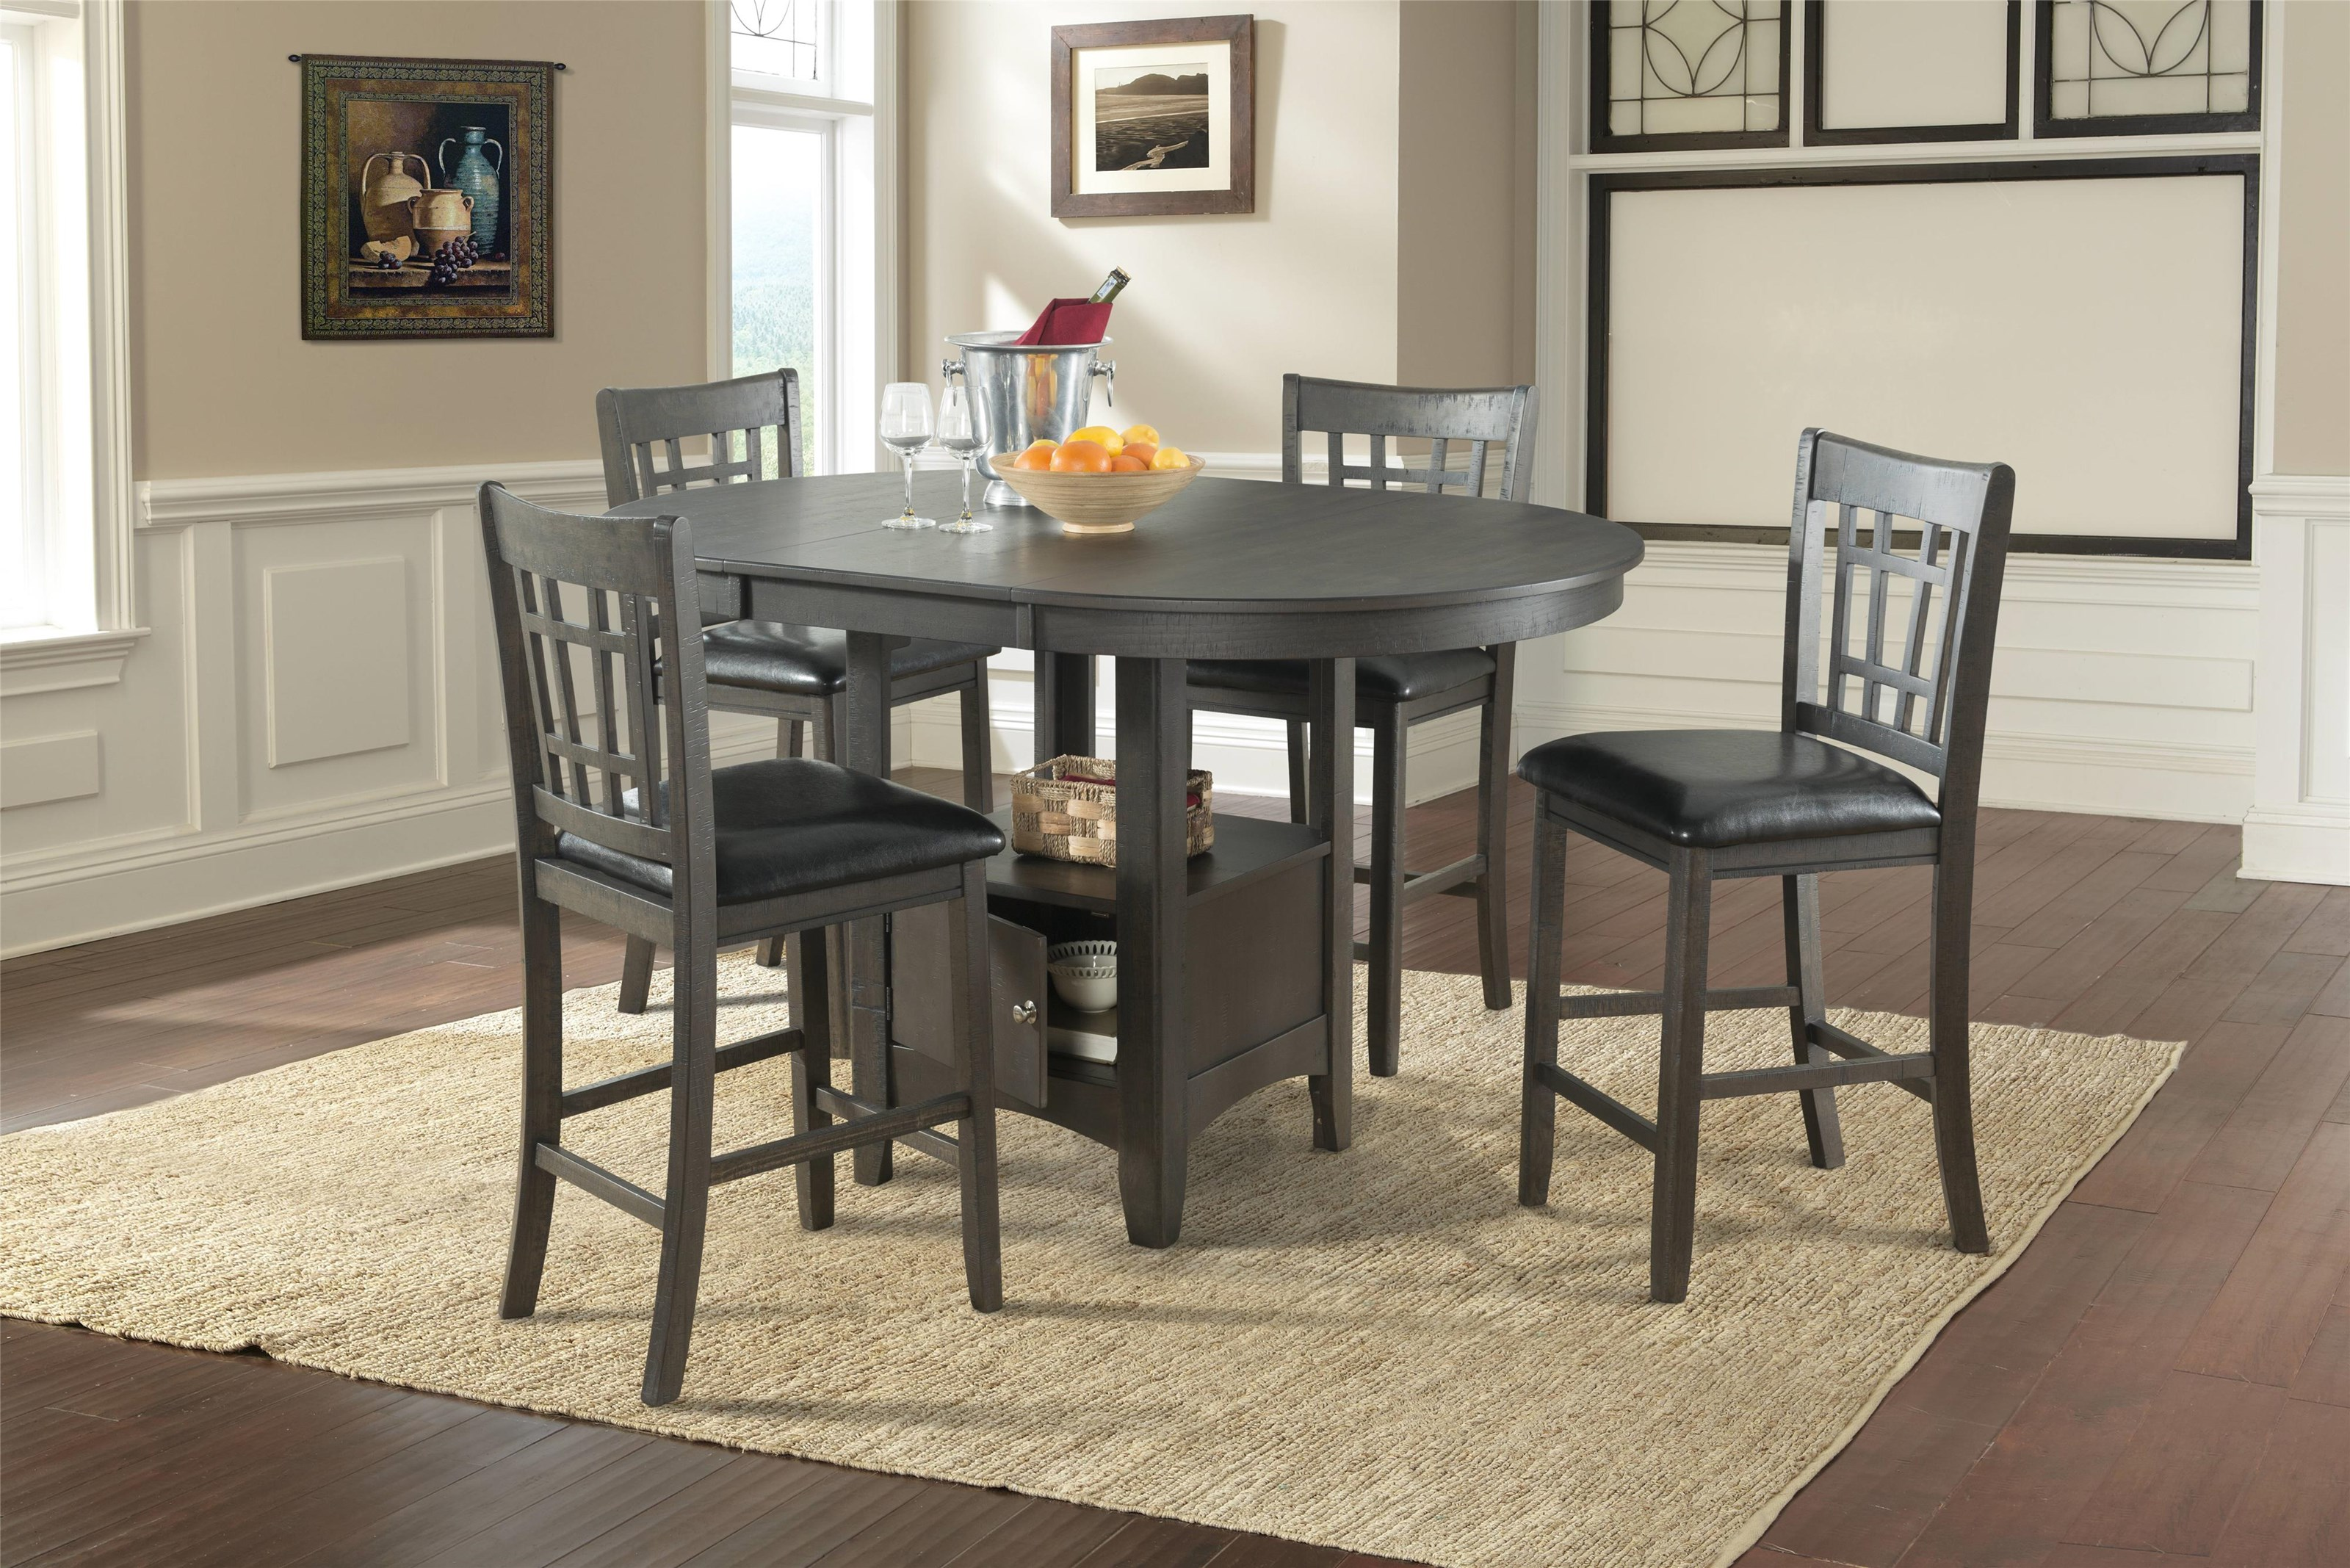 Lifestyle DMX600 GREY Pub table x 4 stools - Item Number: 400-11518-3